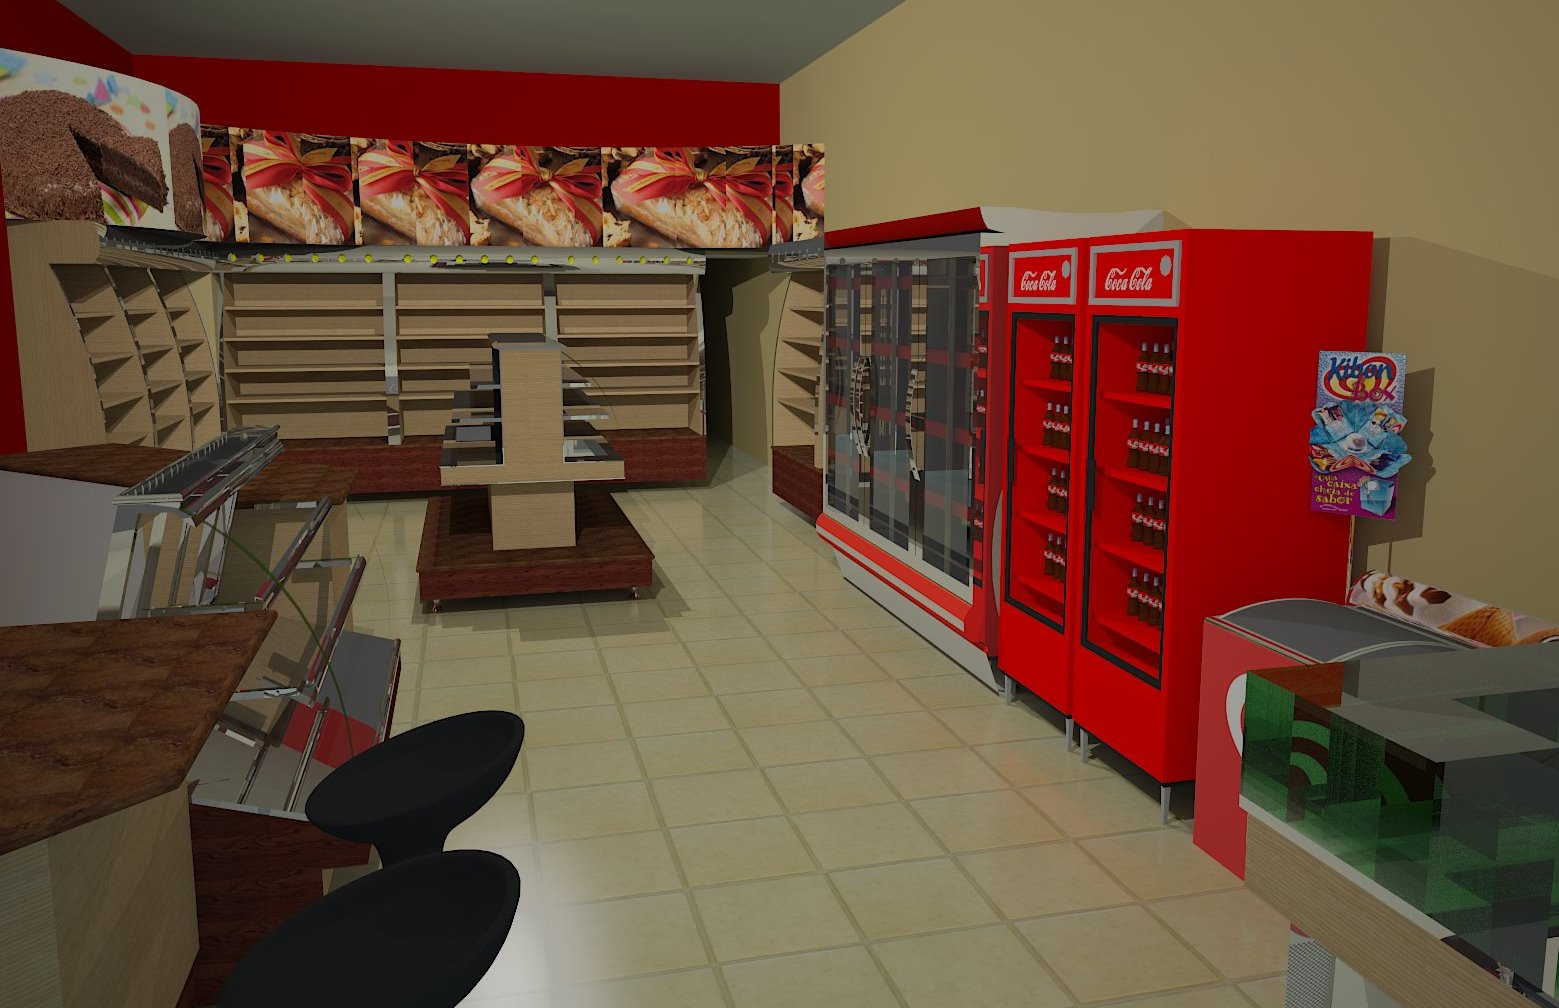 #B30A09 us Arquitetura: Padaria Teófilo Otoni 1559x1008 px Projetos Cozinhas Industriais #73 imagens